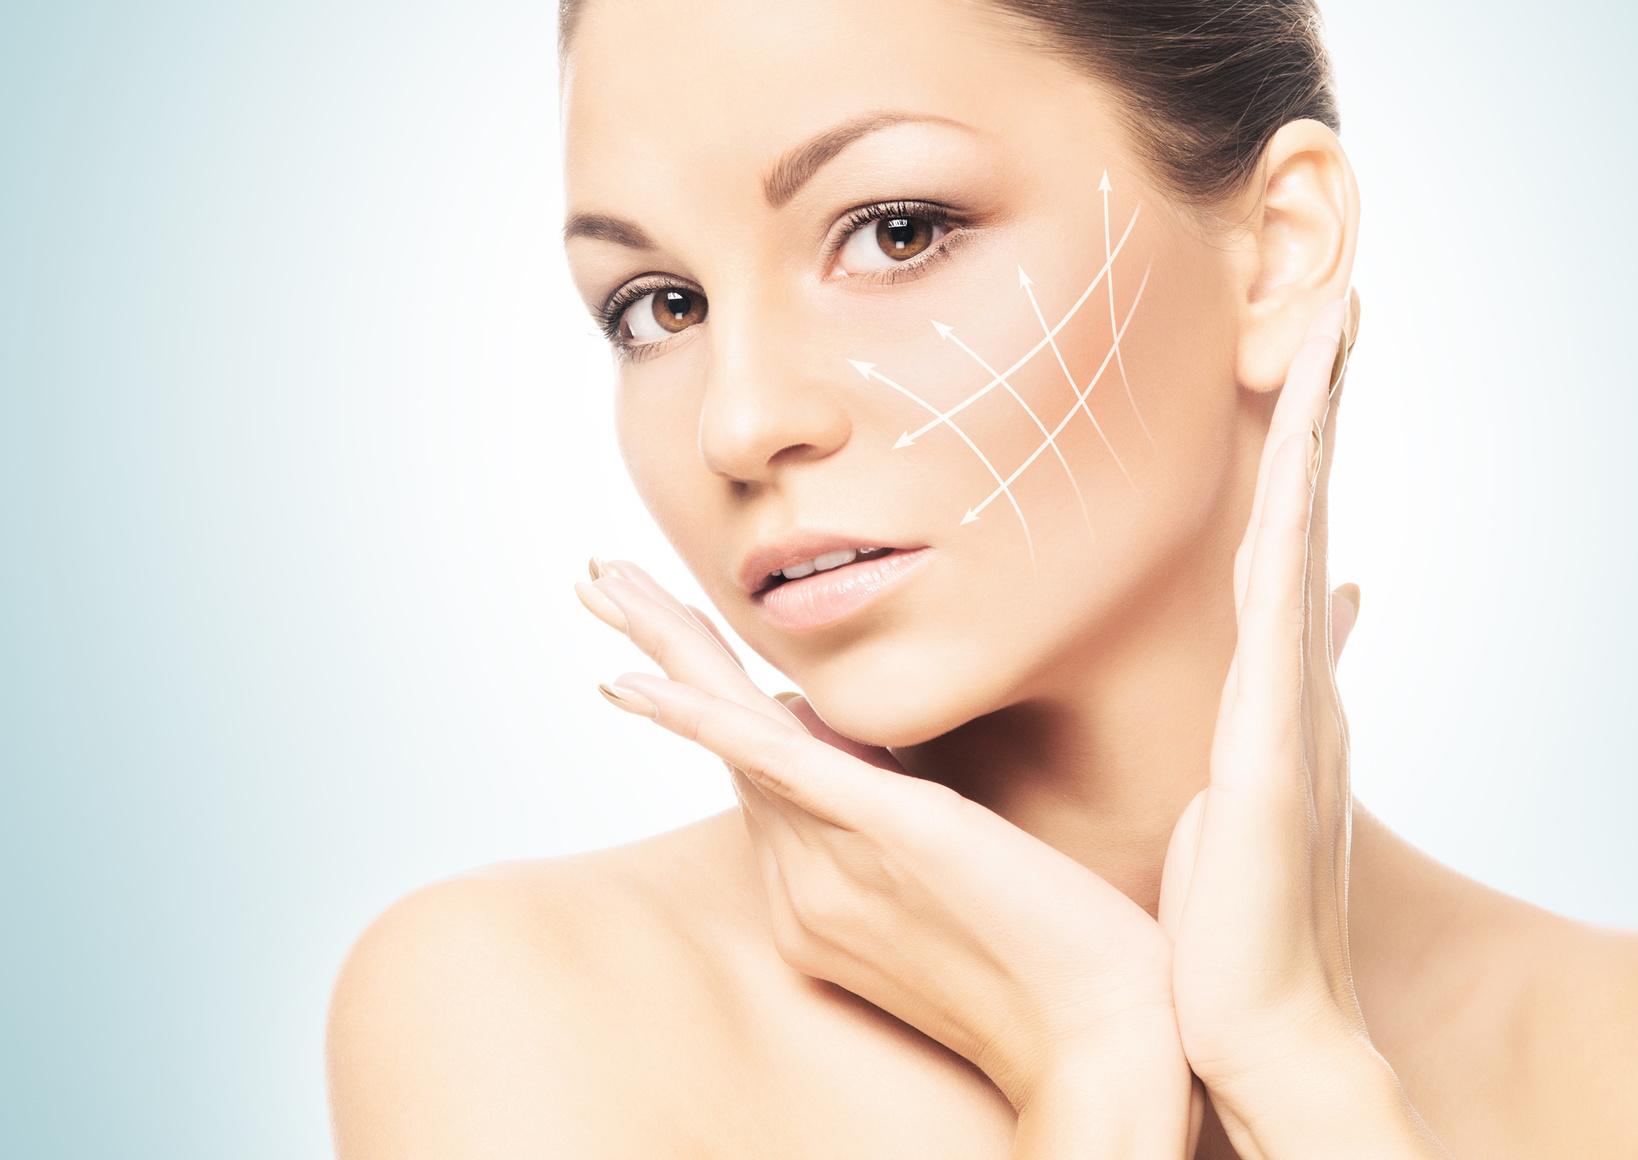 Подтяжка кожи лица и шеи в домашних условиях